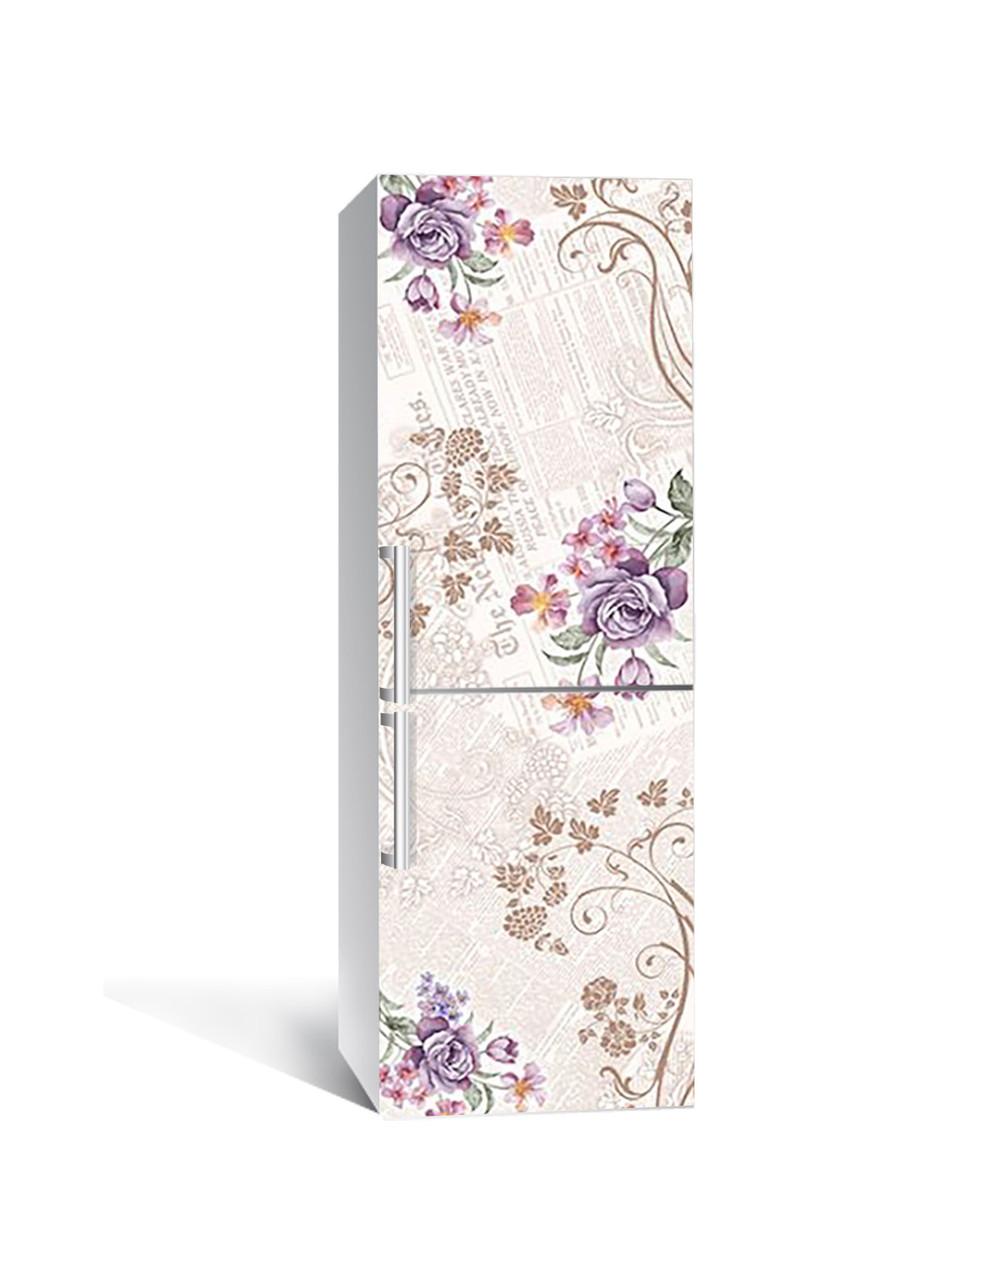 Наклейка на холодильник Zatarga «Винтажная душа» 650х2000 мм виниловая 3Д наклейка декор на кухню